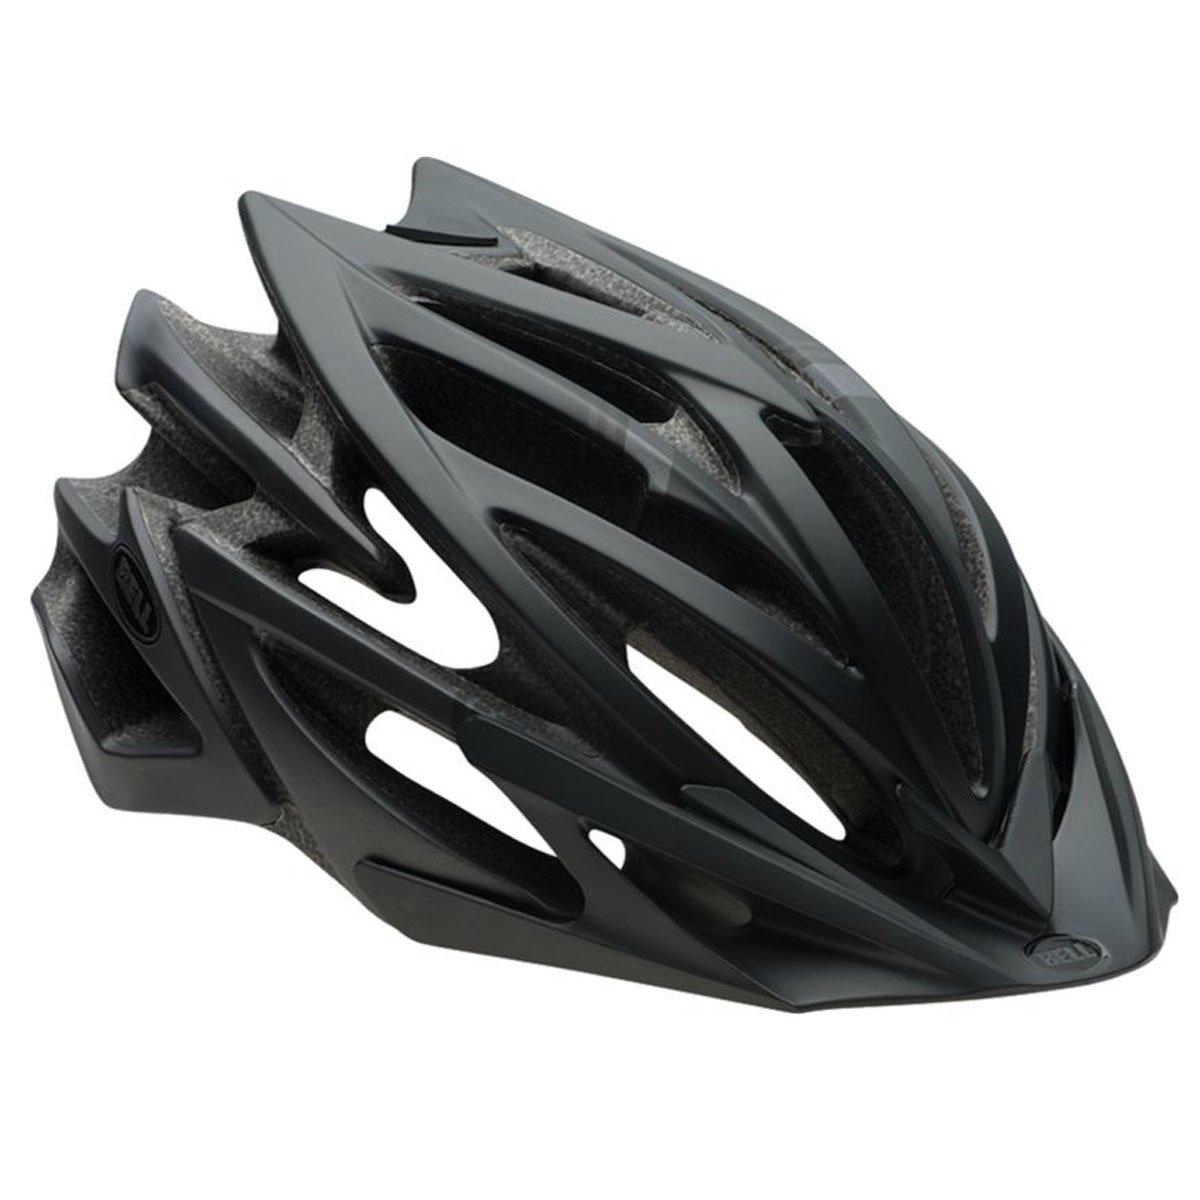 Bell Mens BH23110 Volt XC Bike Helmet, Matte Black Hero – S